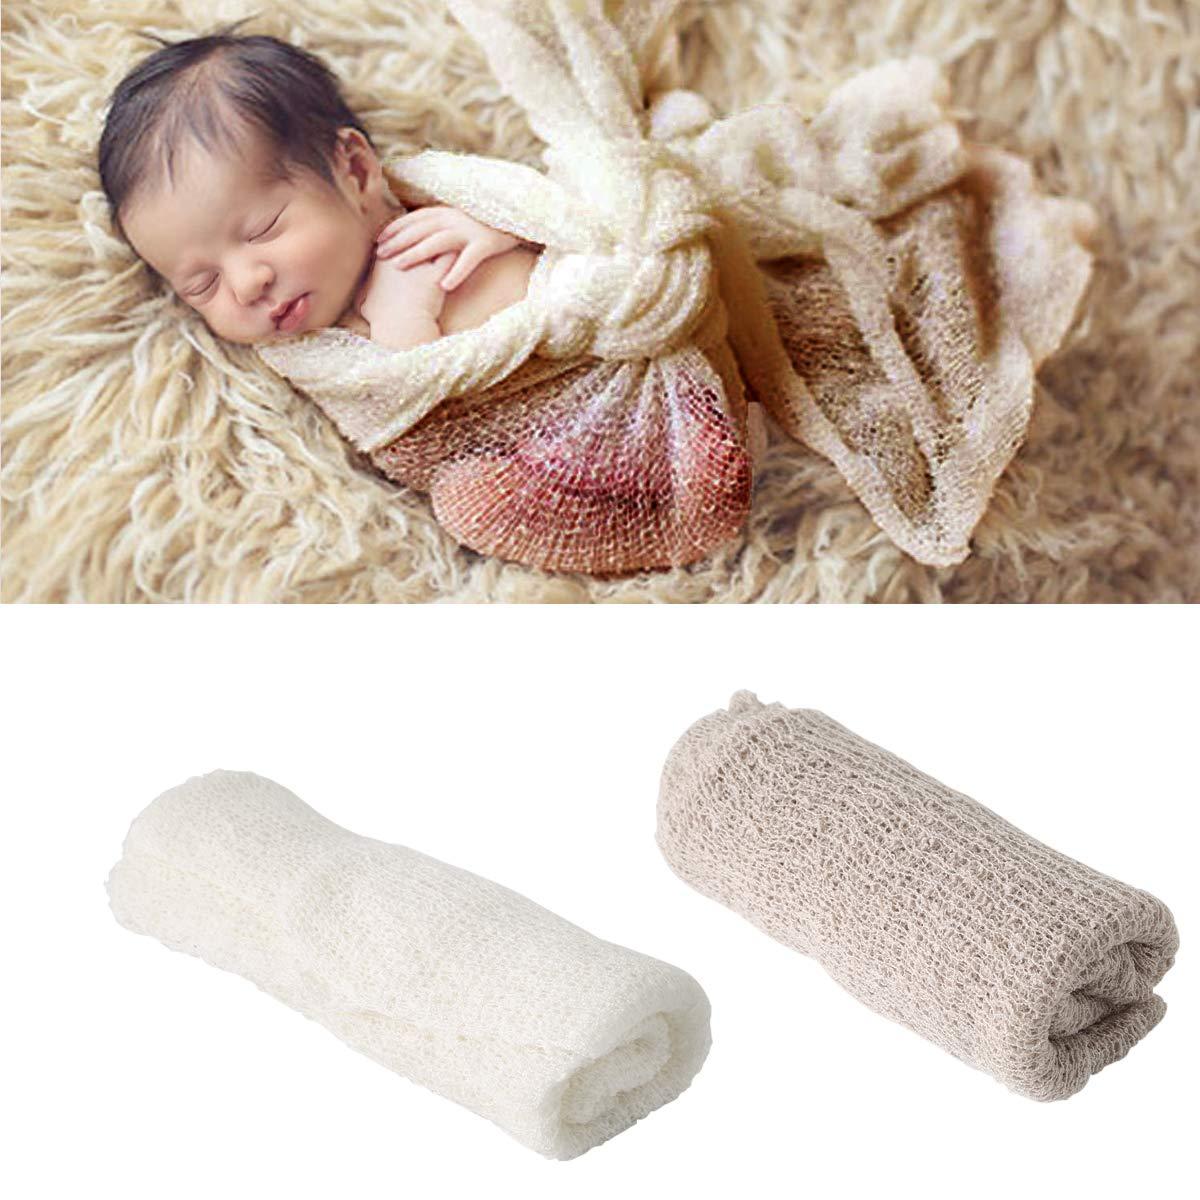 Qinhum Newborn Baby Photography Photo Props Backdrop Soft Fur Blanket Swaddle Wrap Set